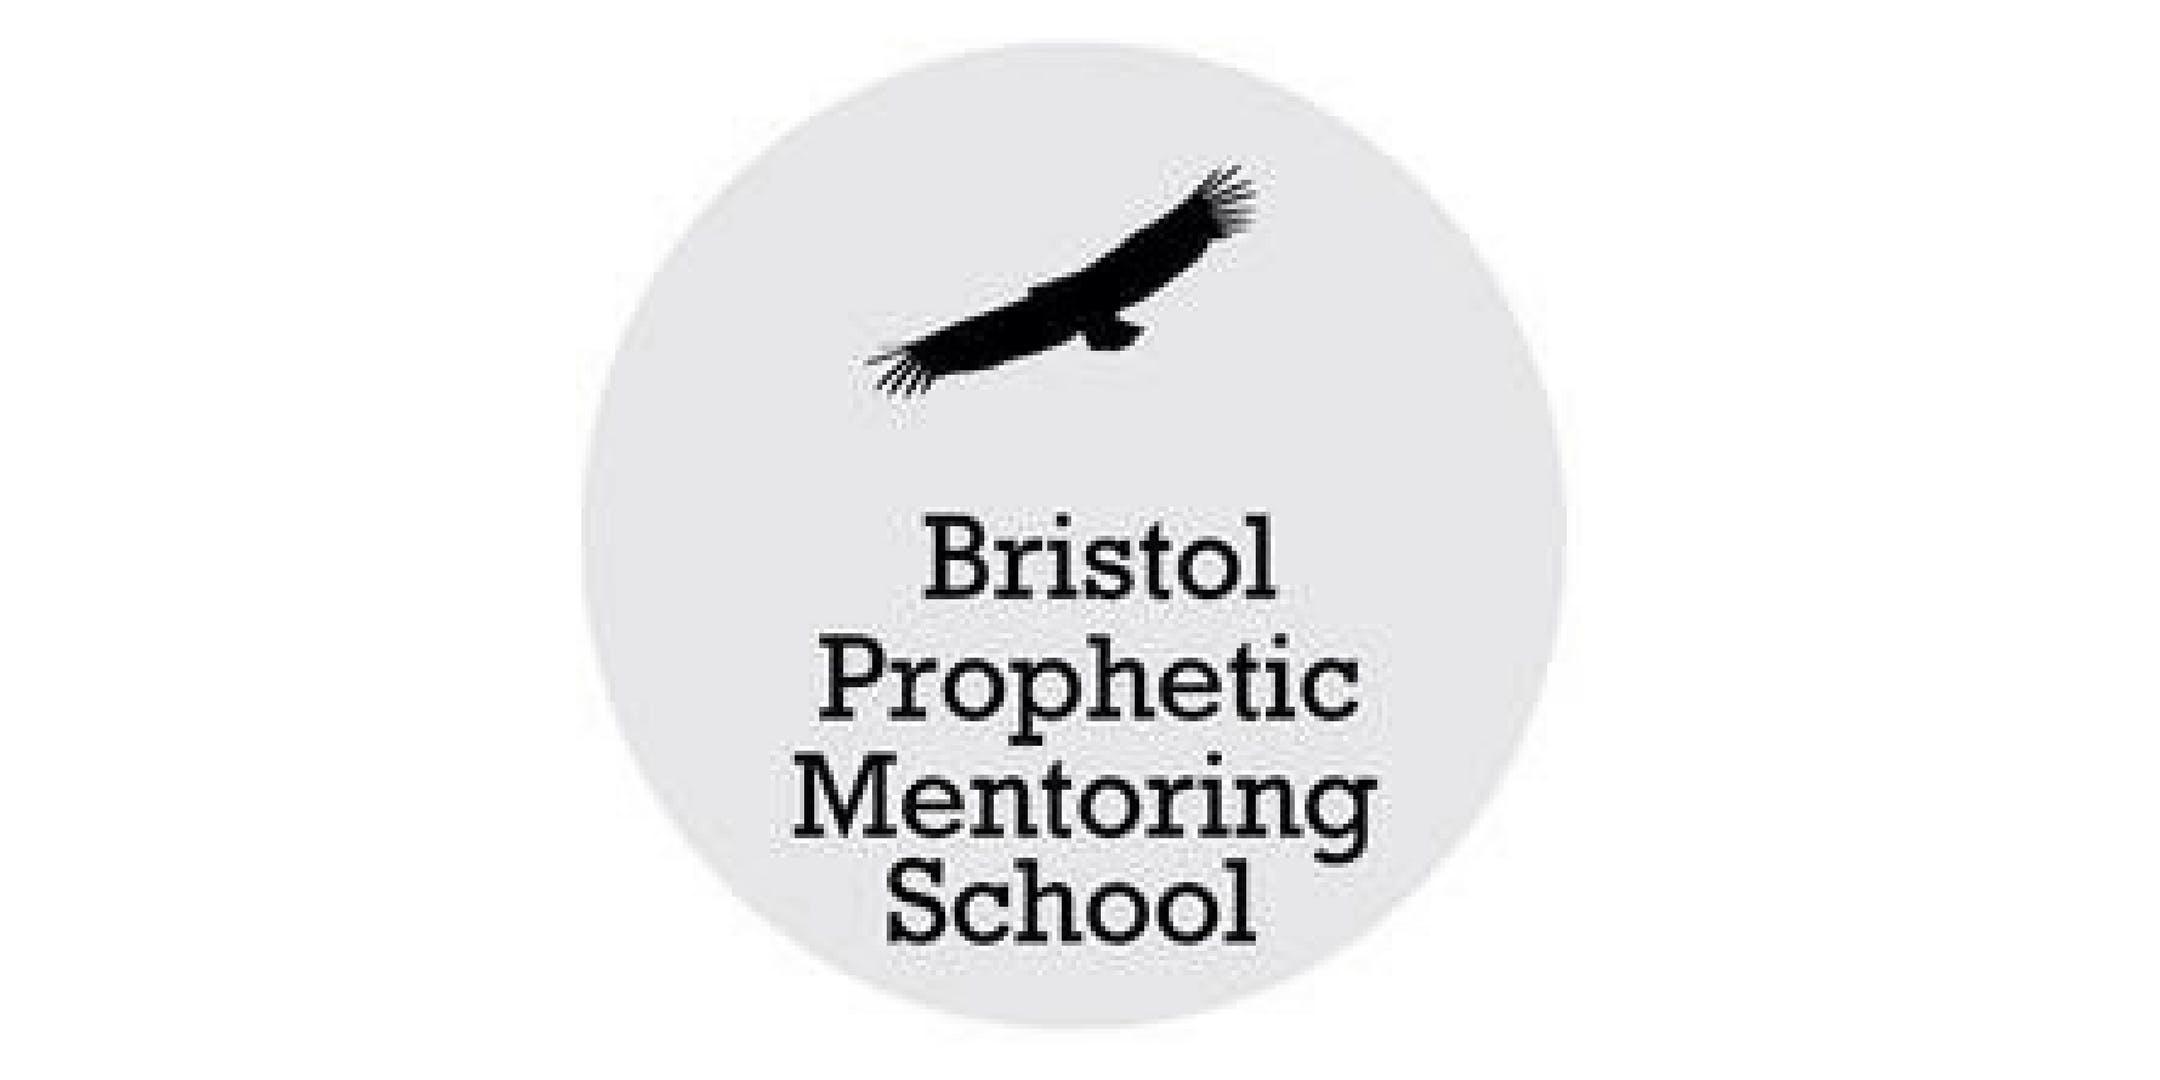 Bristol Prophetic Mentoring School - Autumn T